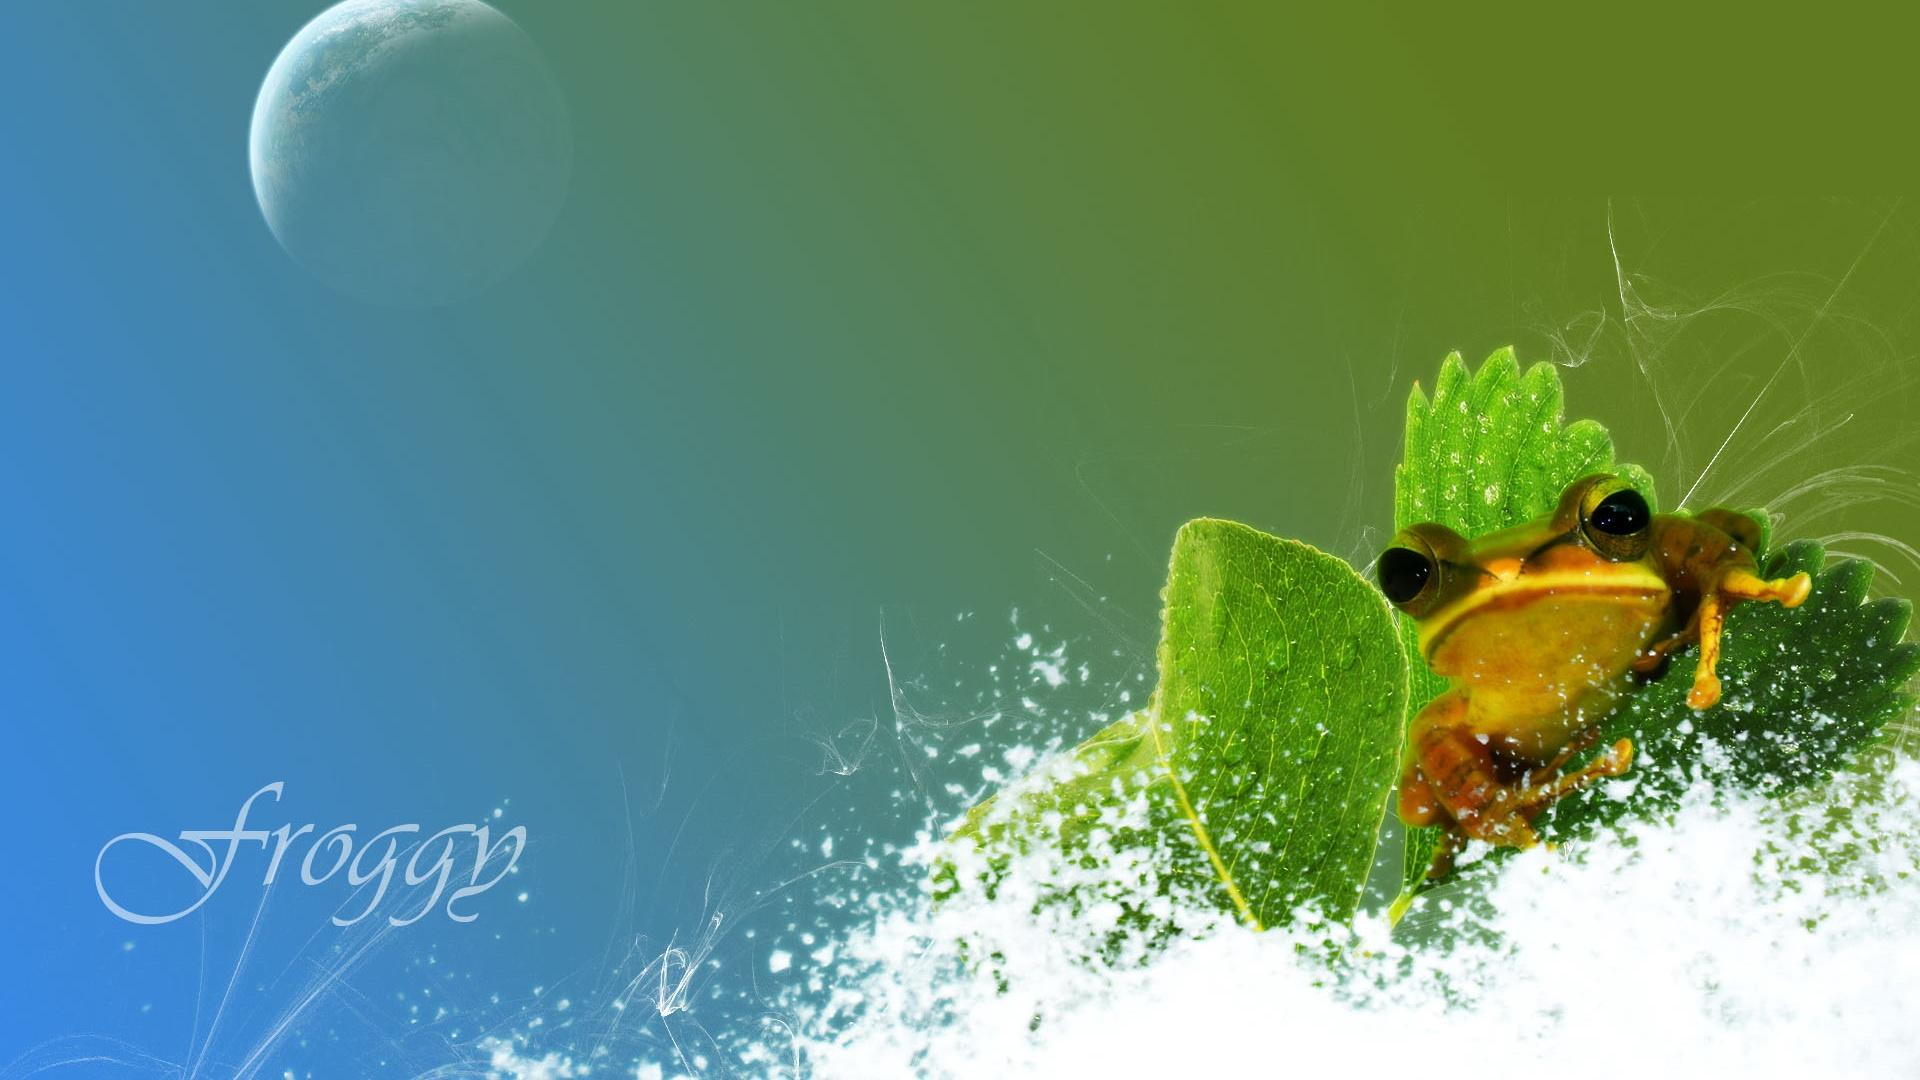 Water Design Wallpaper : Creative design frog and water wallpaper  full